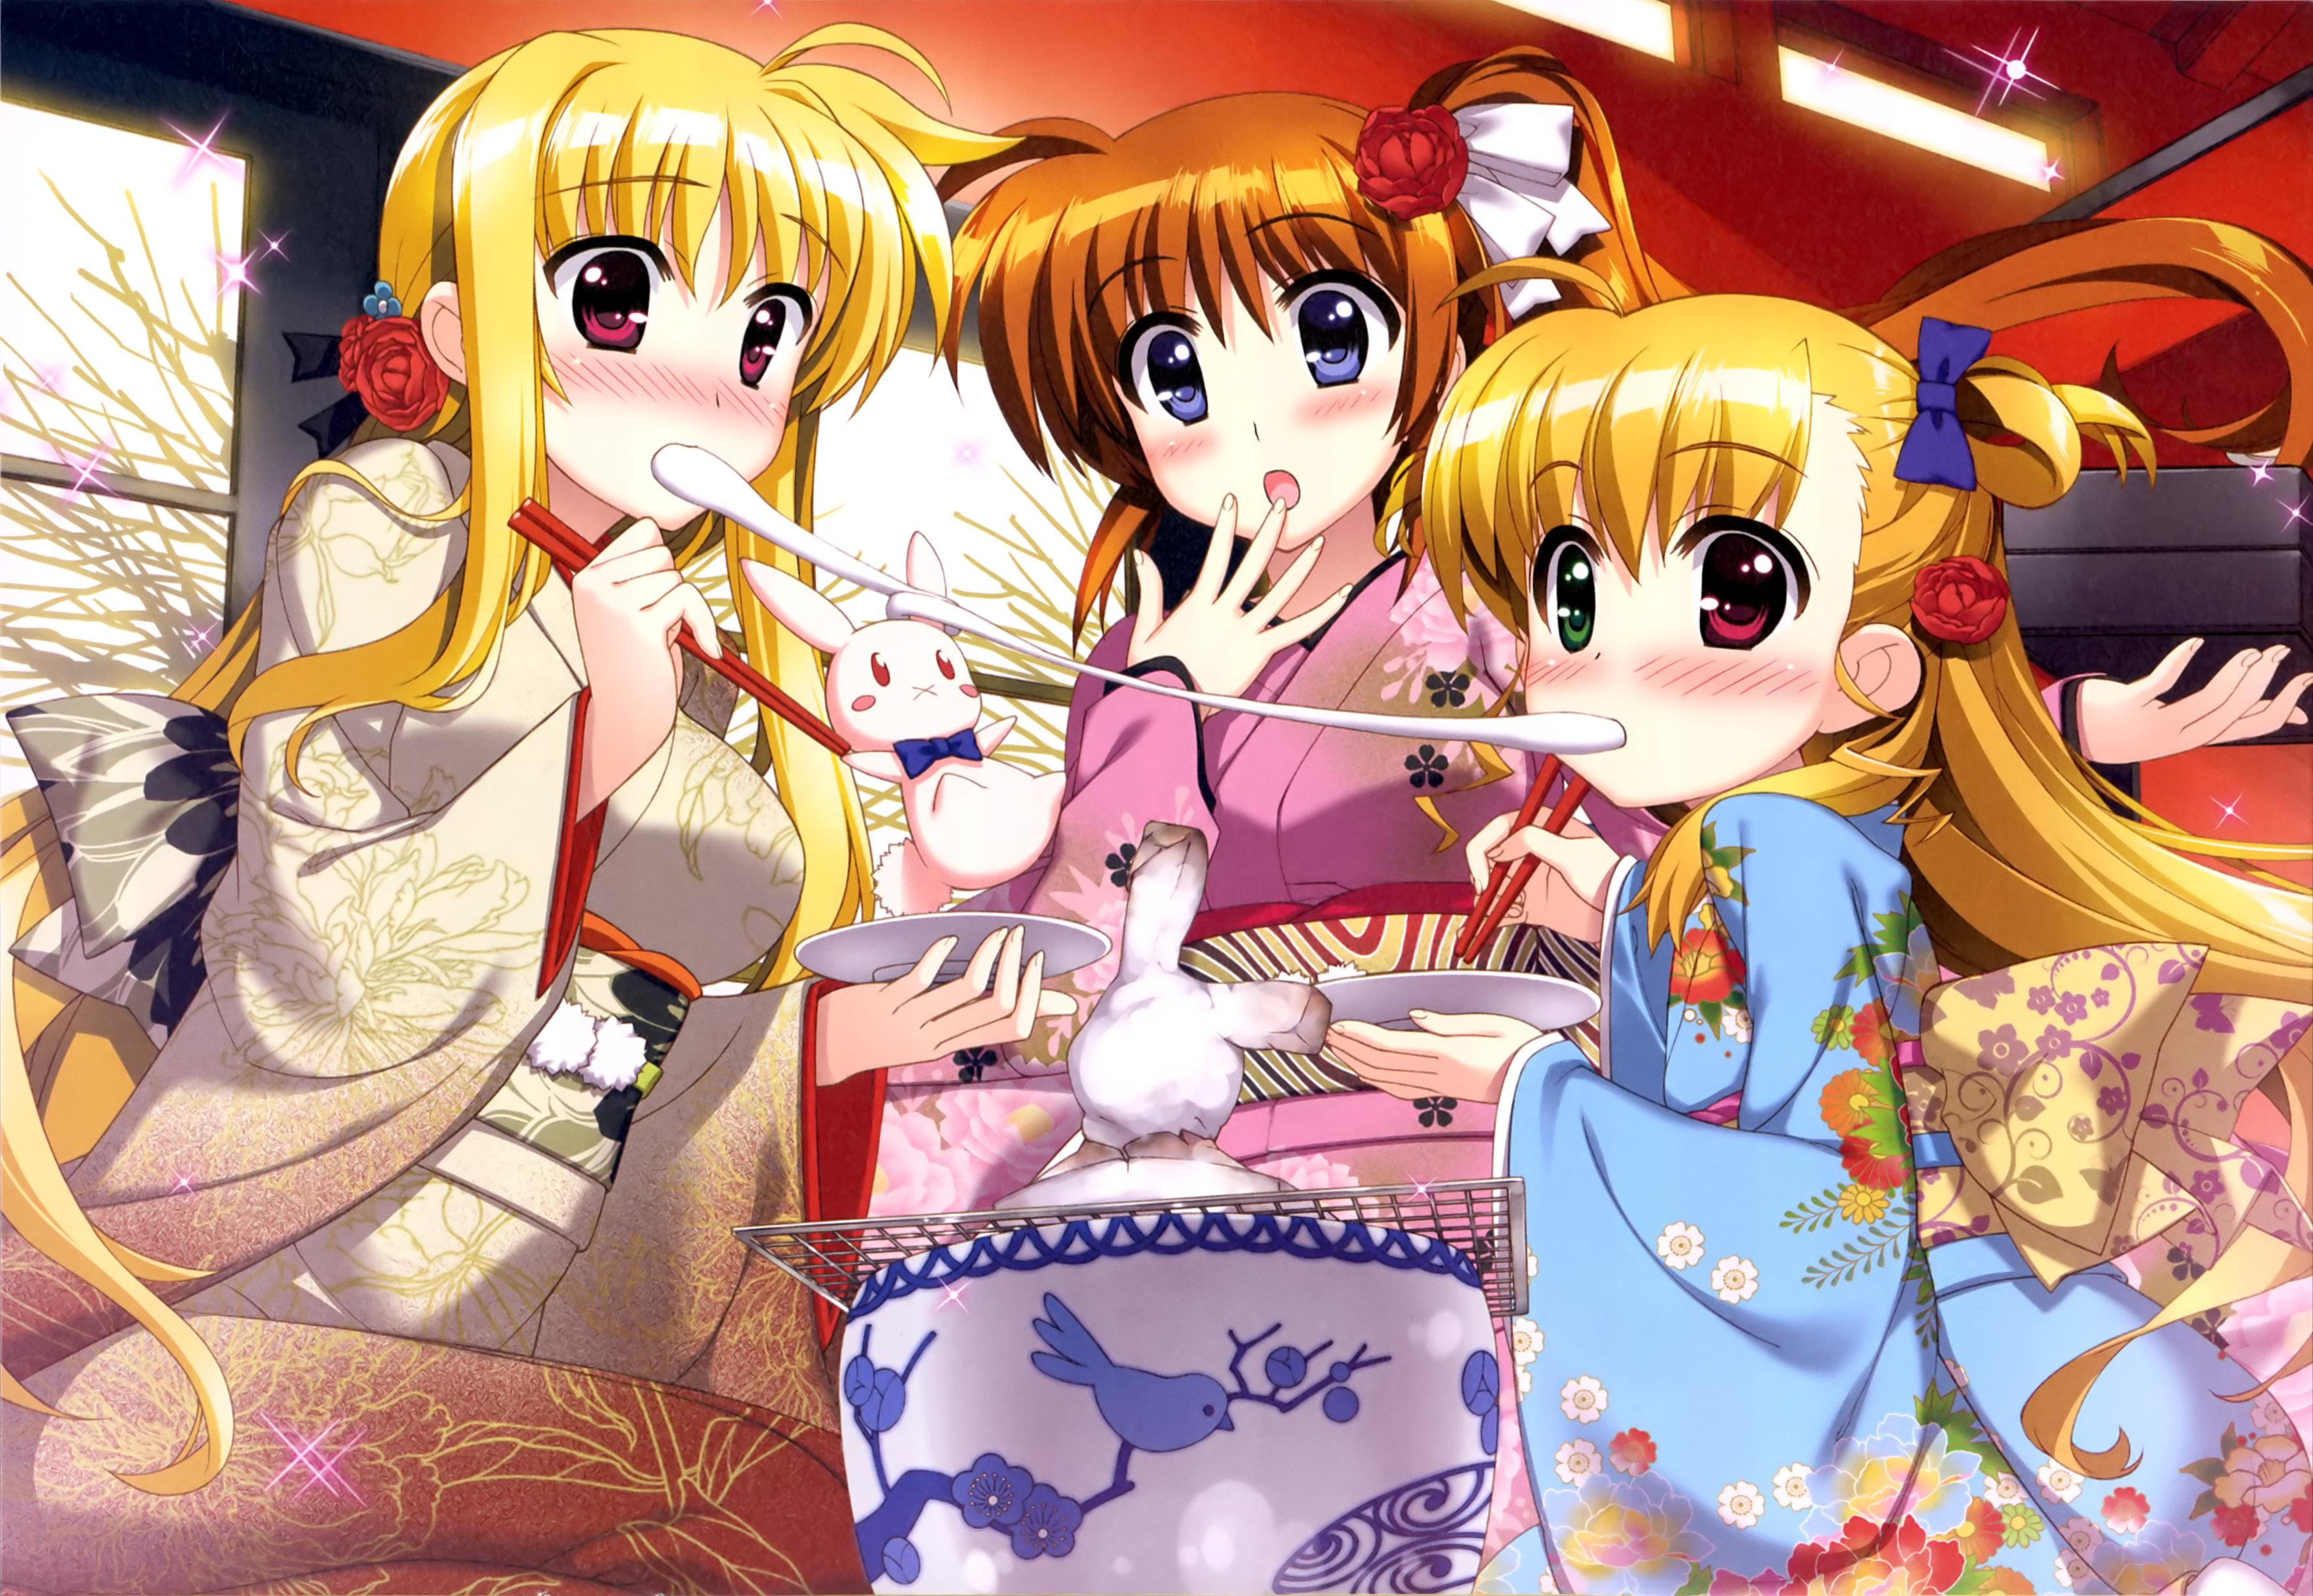 2015 New Year Greetings Anime Style haruhichan.com Mahou Shoujo Lyrical Nanoha ViVid